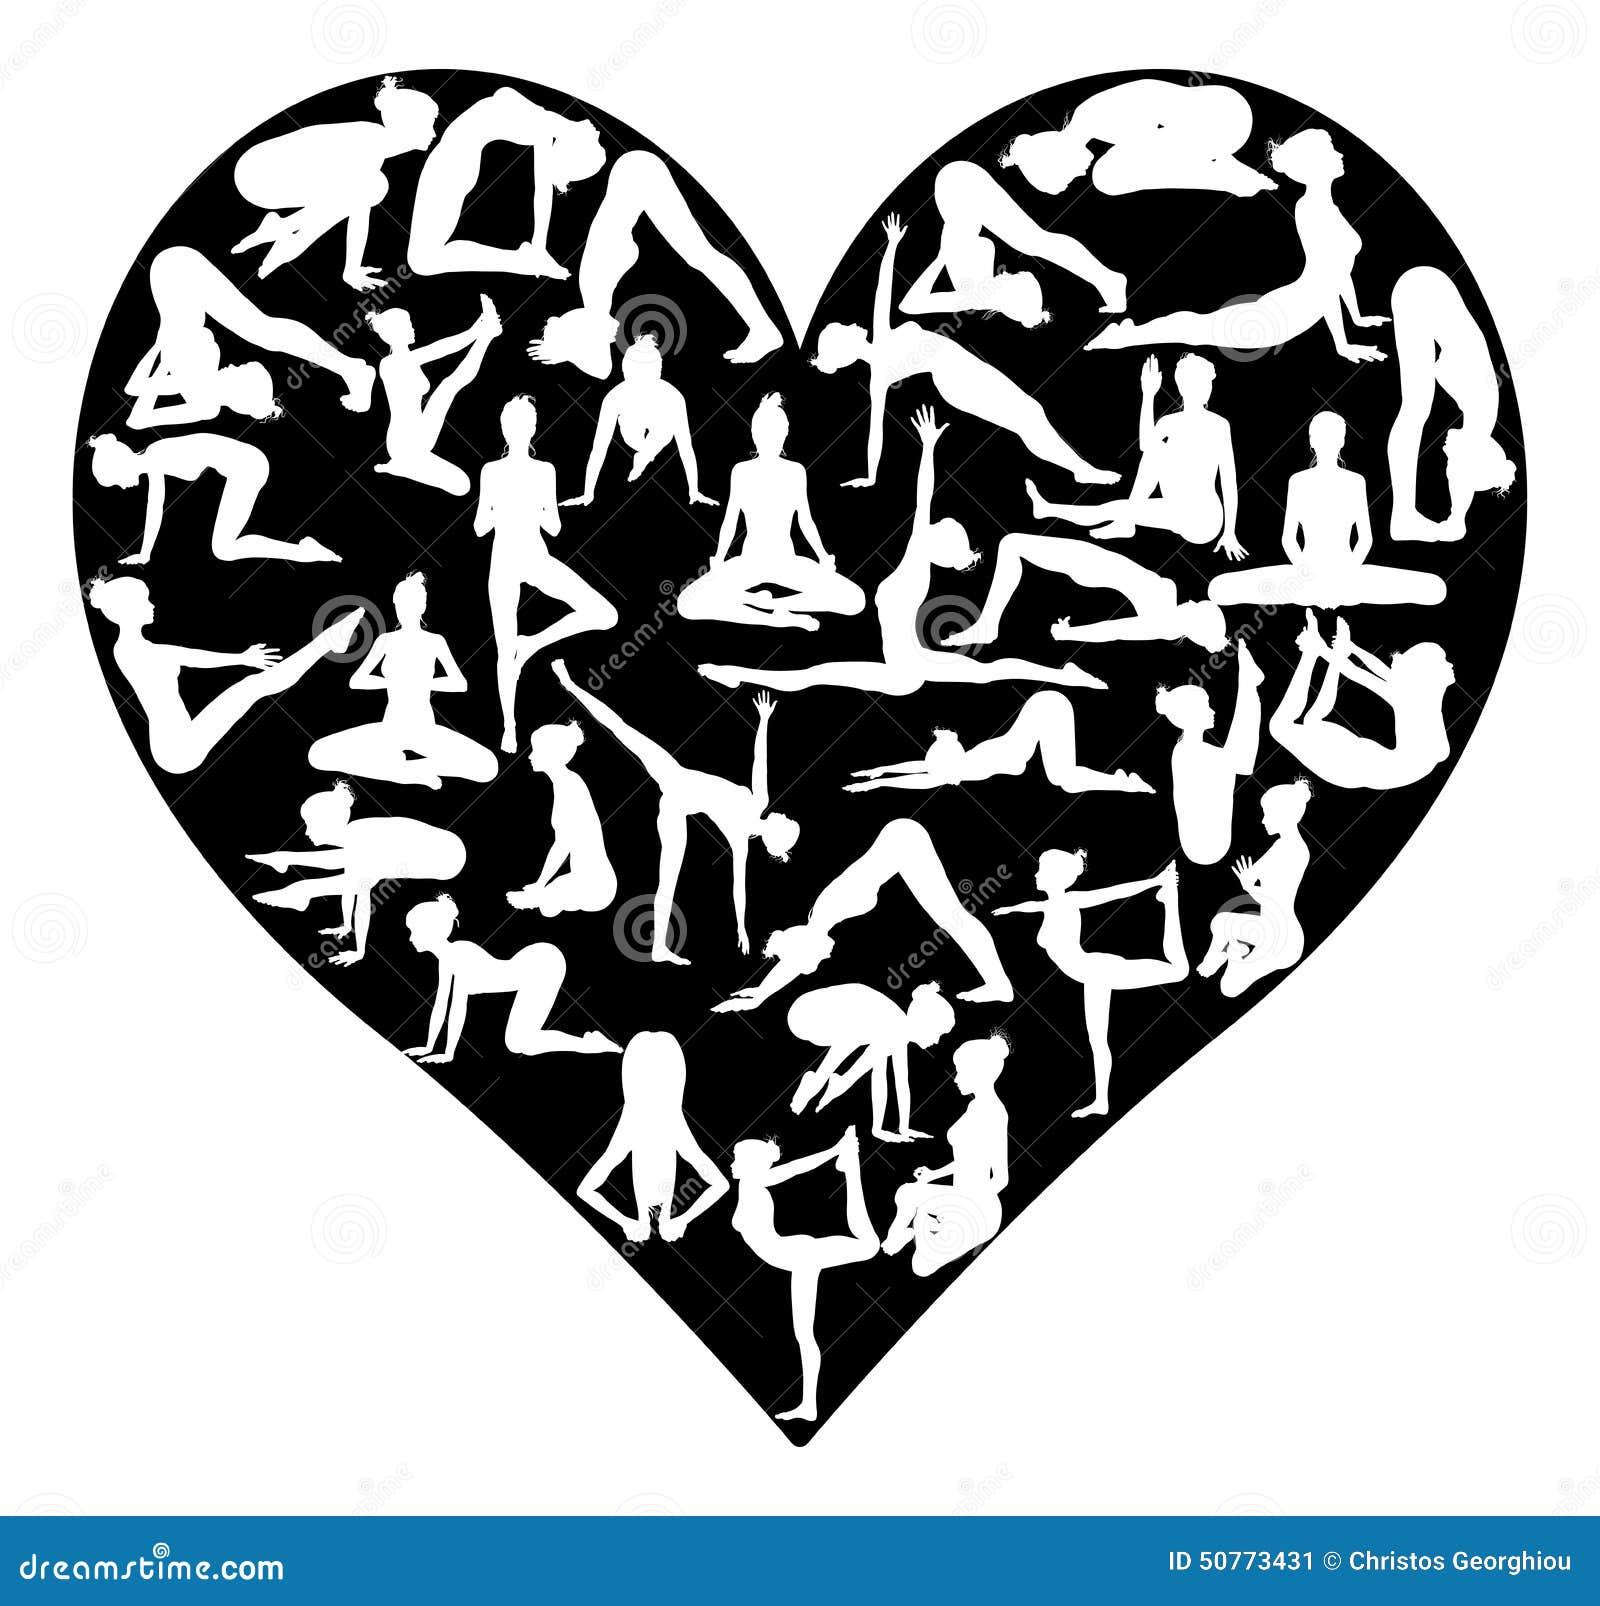 Home Design Studio Download Free Yoga Pilates Heart Stock Vector Image 50773431